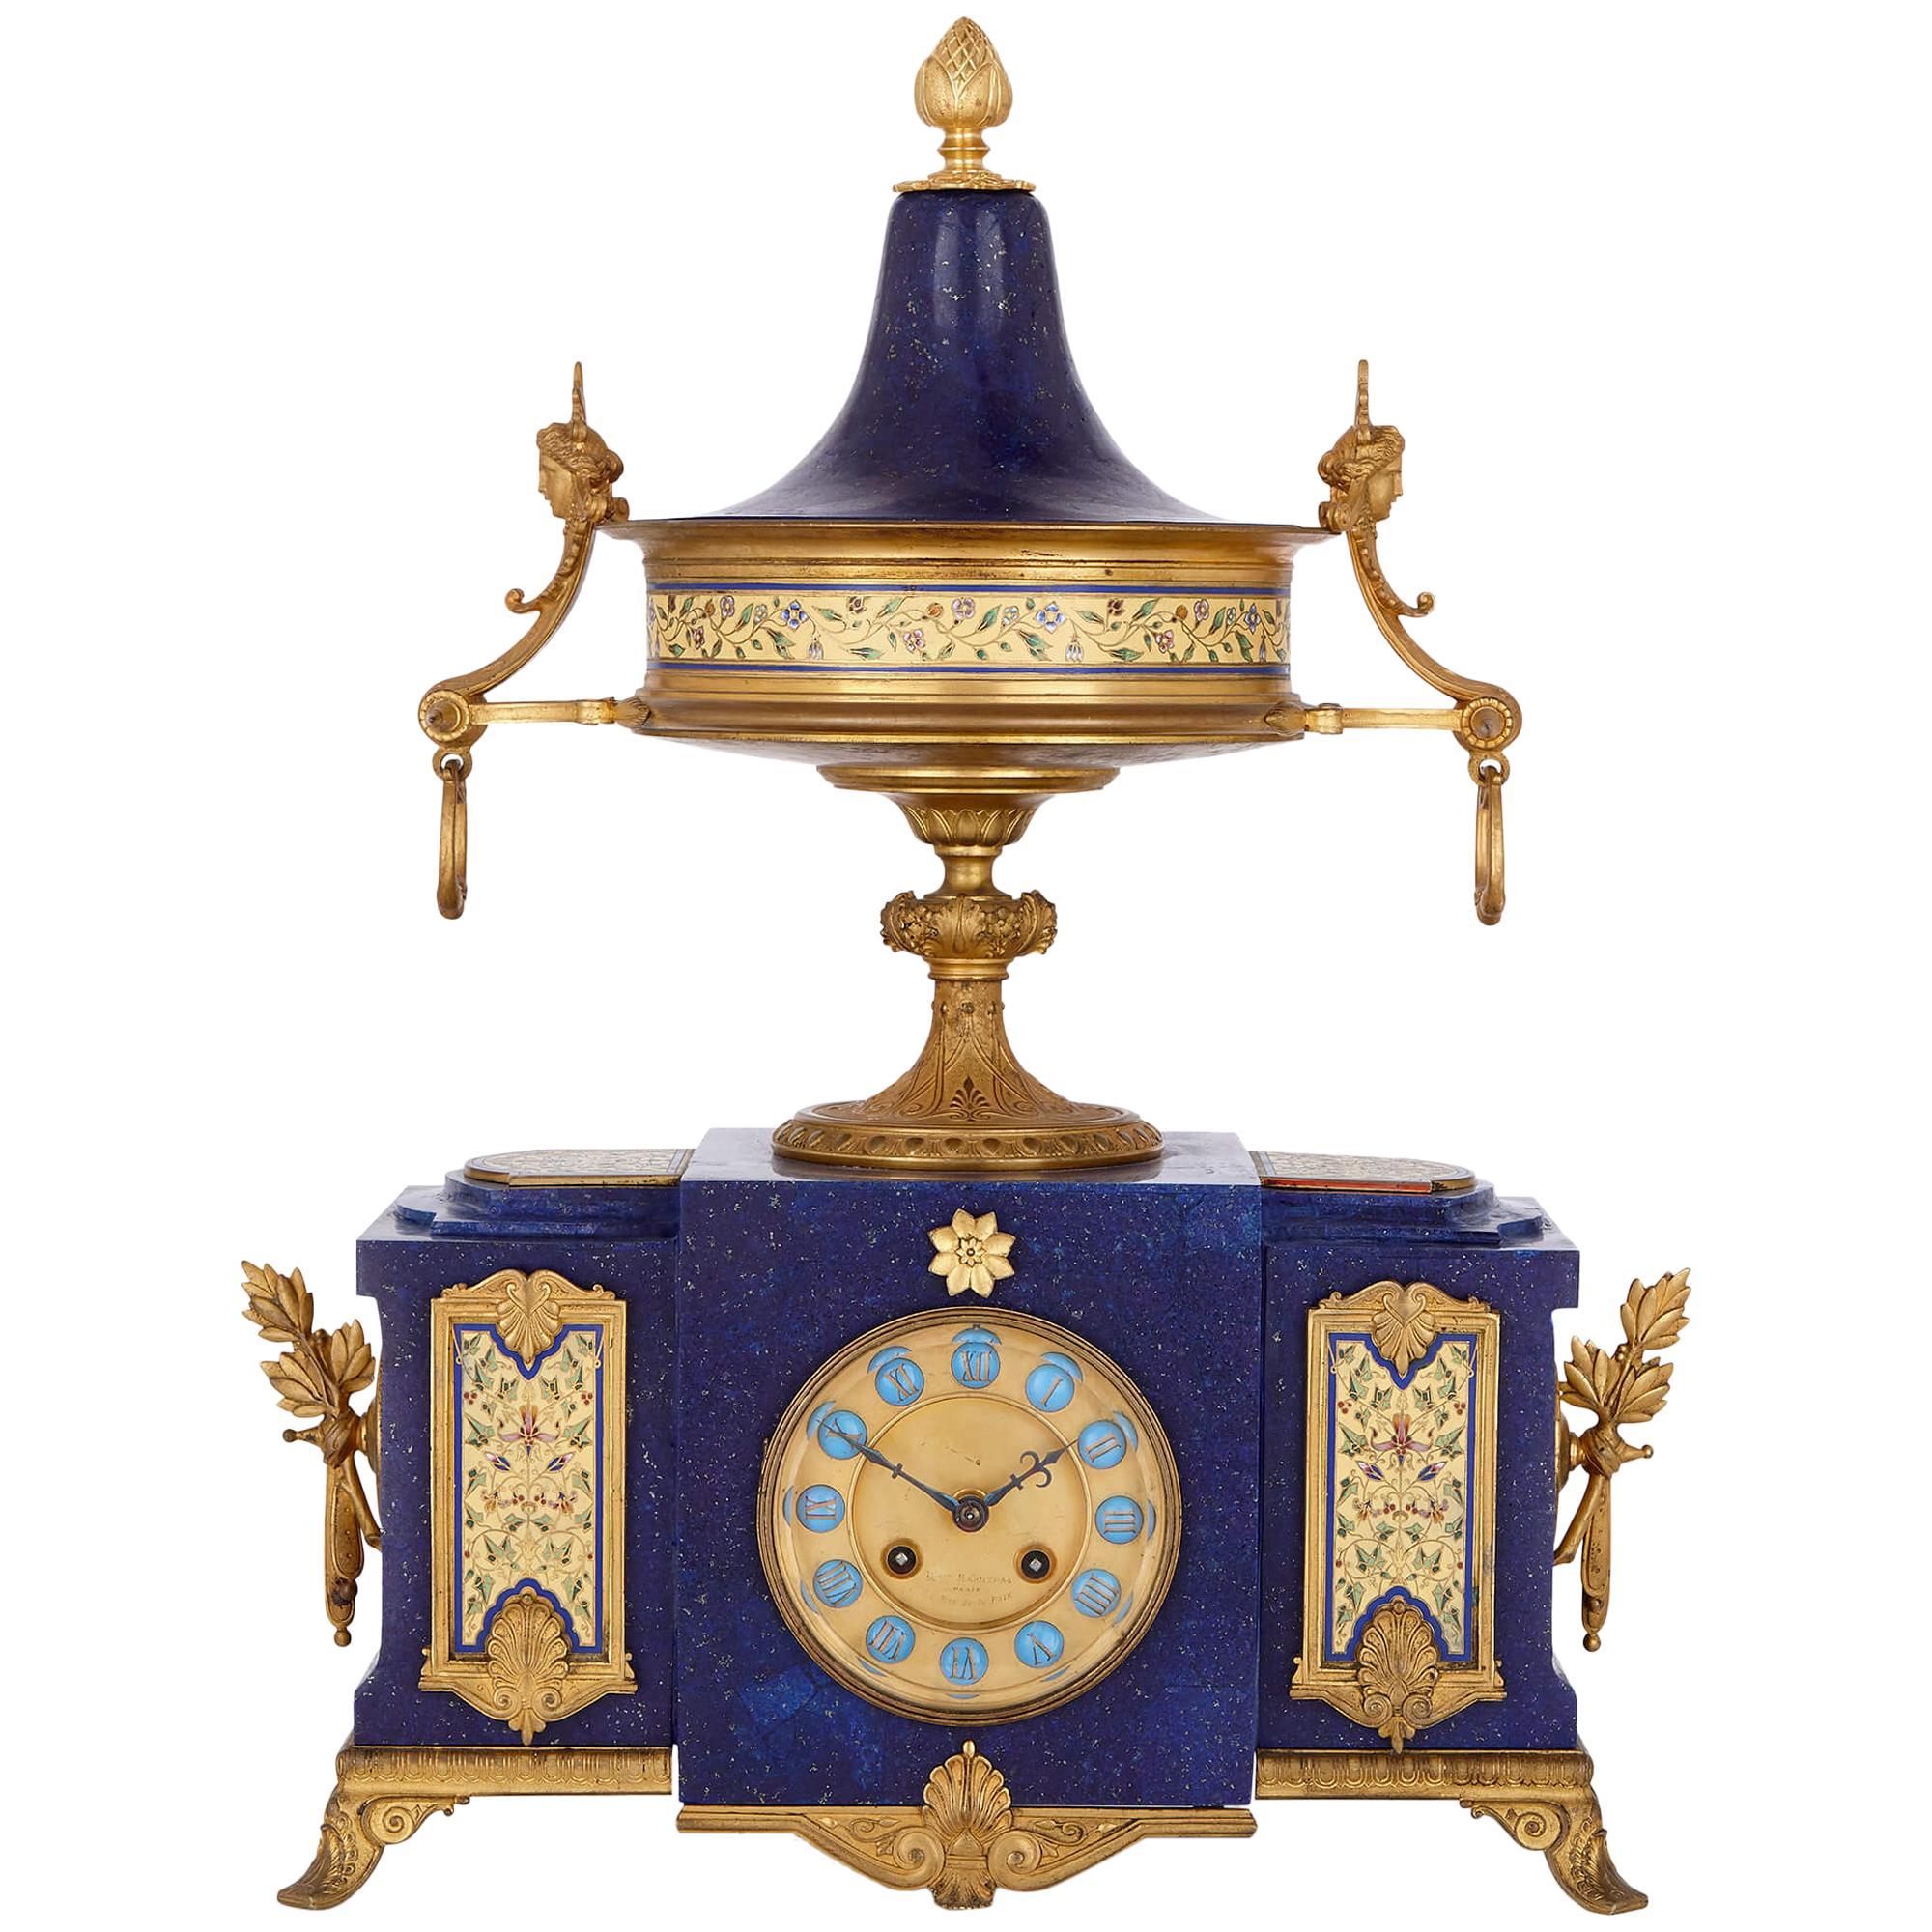 Neoclassical Style Gilt Bronze, Enamel and Lapis Lazuli Mantel Clock